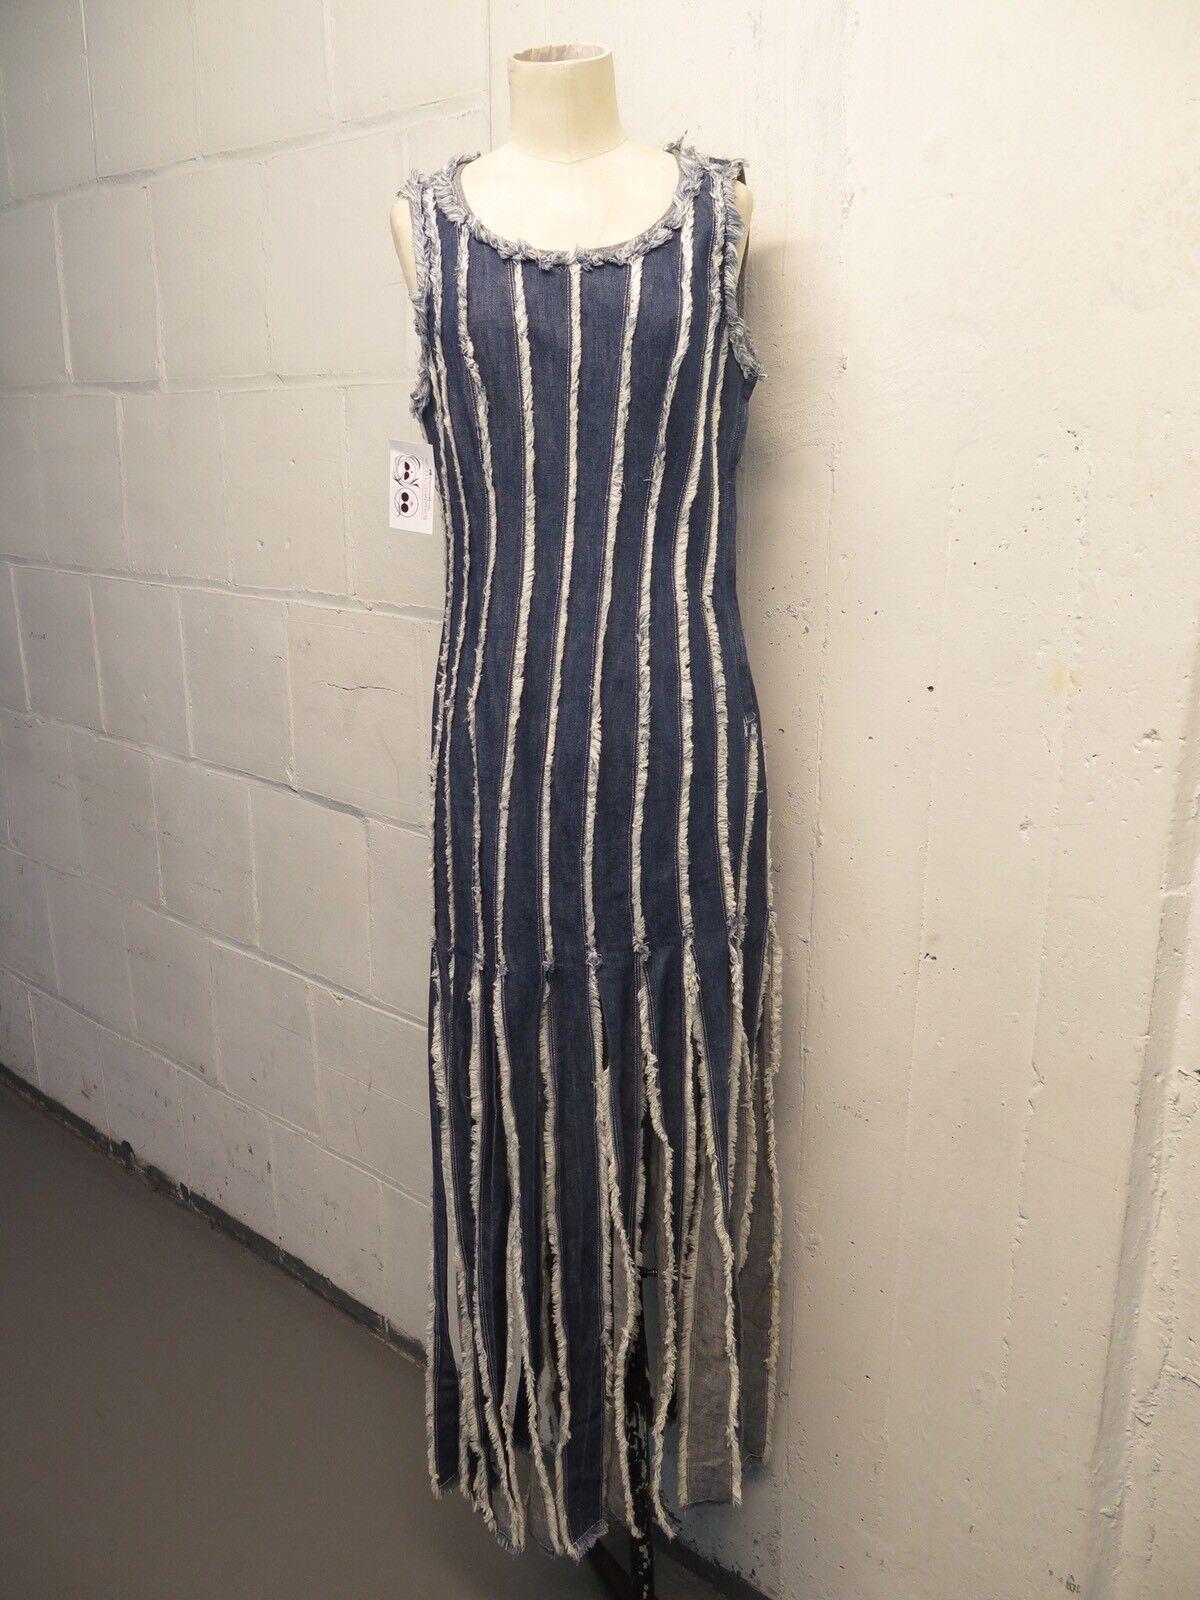 Jean Paul Gaultier JPG JPG JPG Jeans Denim Patchwork Car Wash Fringe Dress Sz 8 bbaada